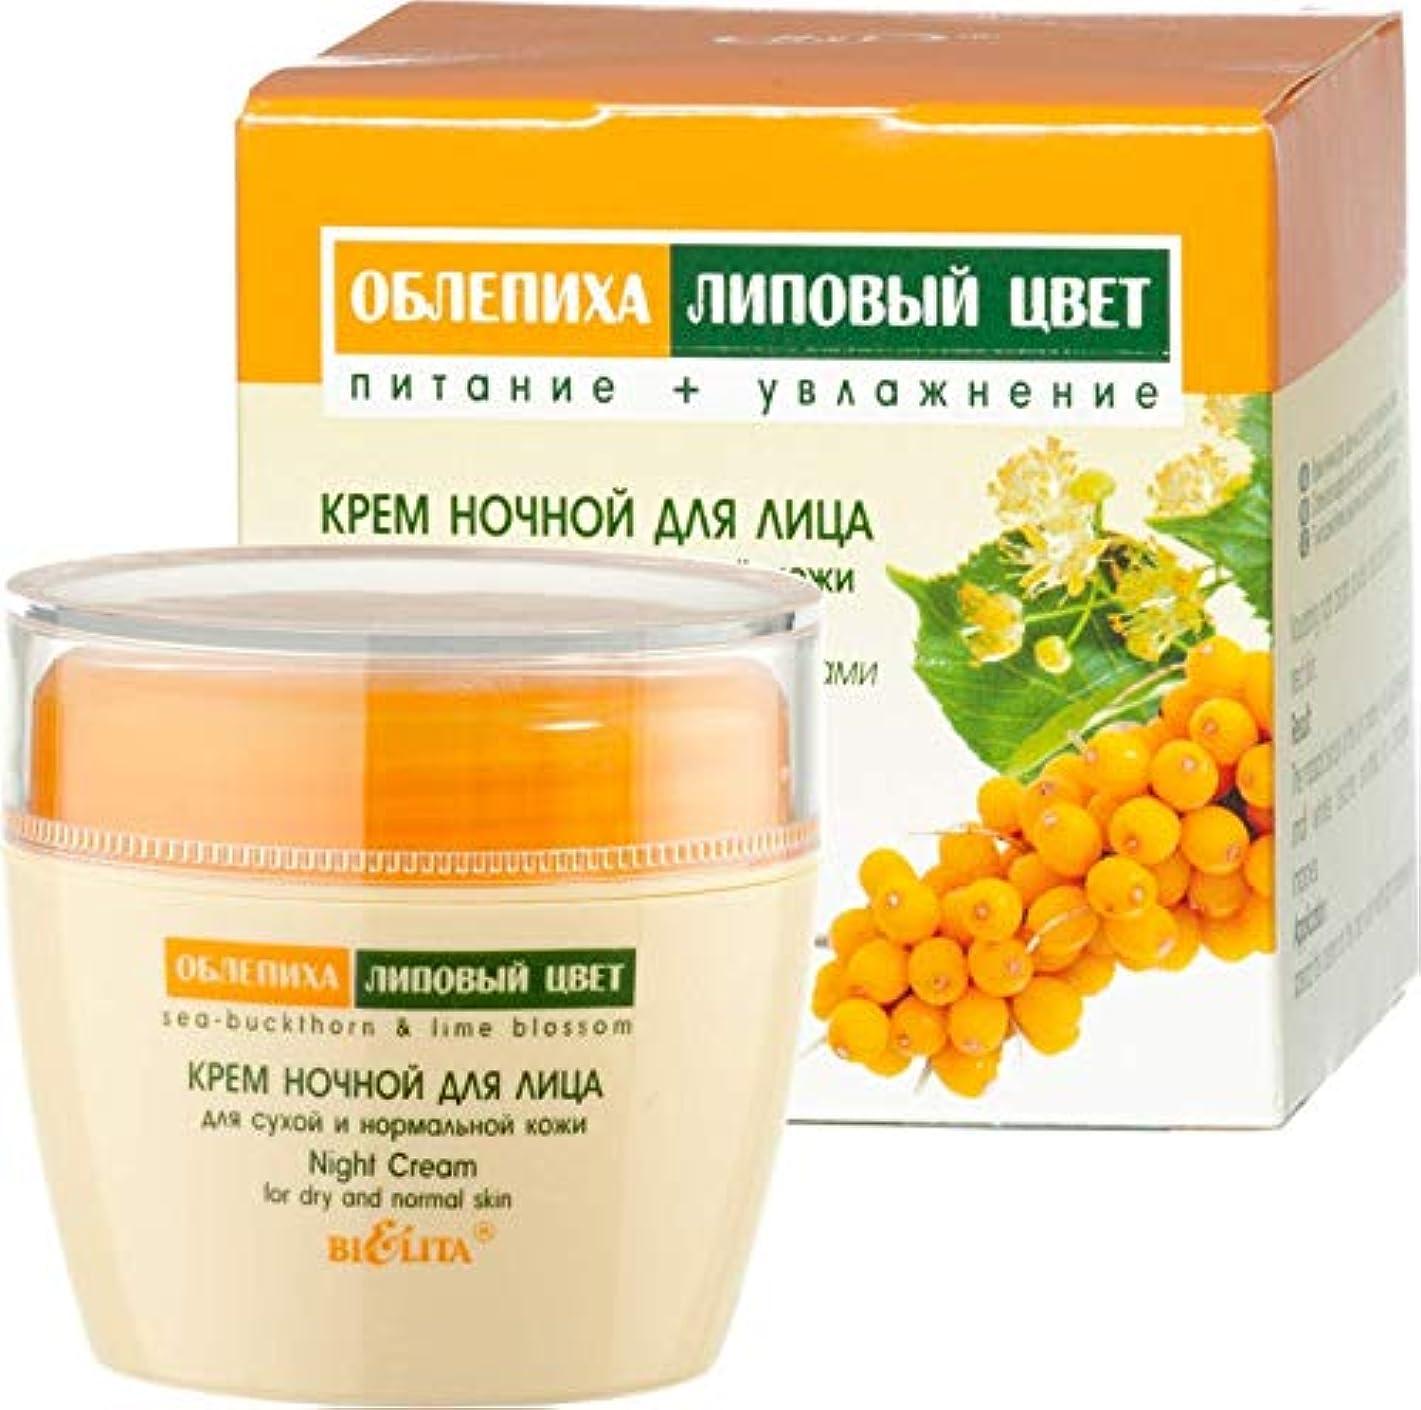 Bielita & Vitex | Sea-Buckthorn Line | Night Face Cream for Dry and Normal Skin, 50 ml | Sea-Buckthorn Oil, Lime...